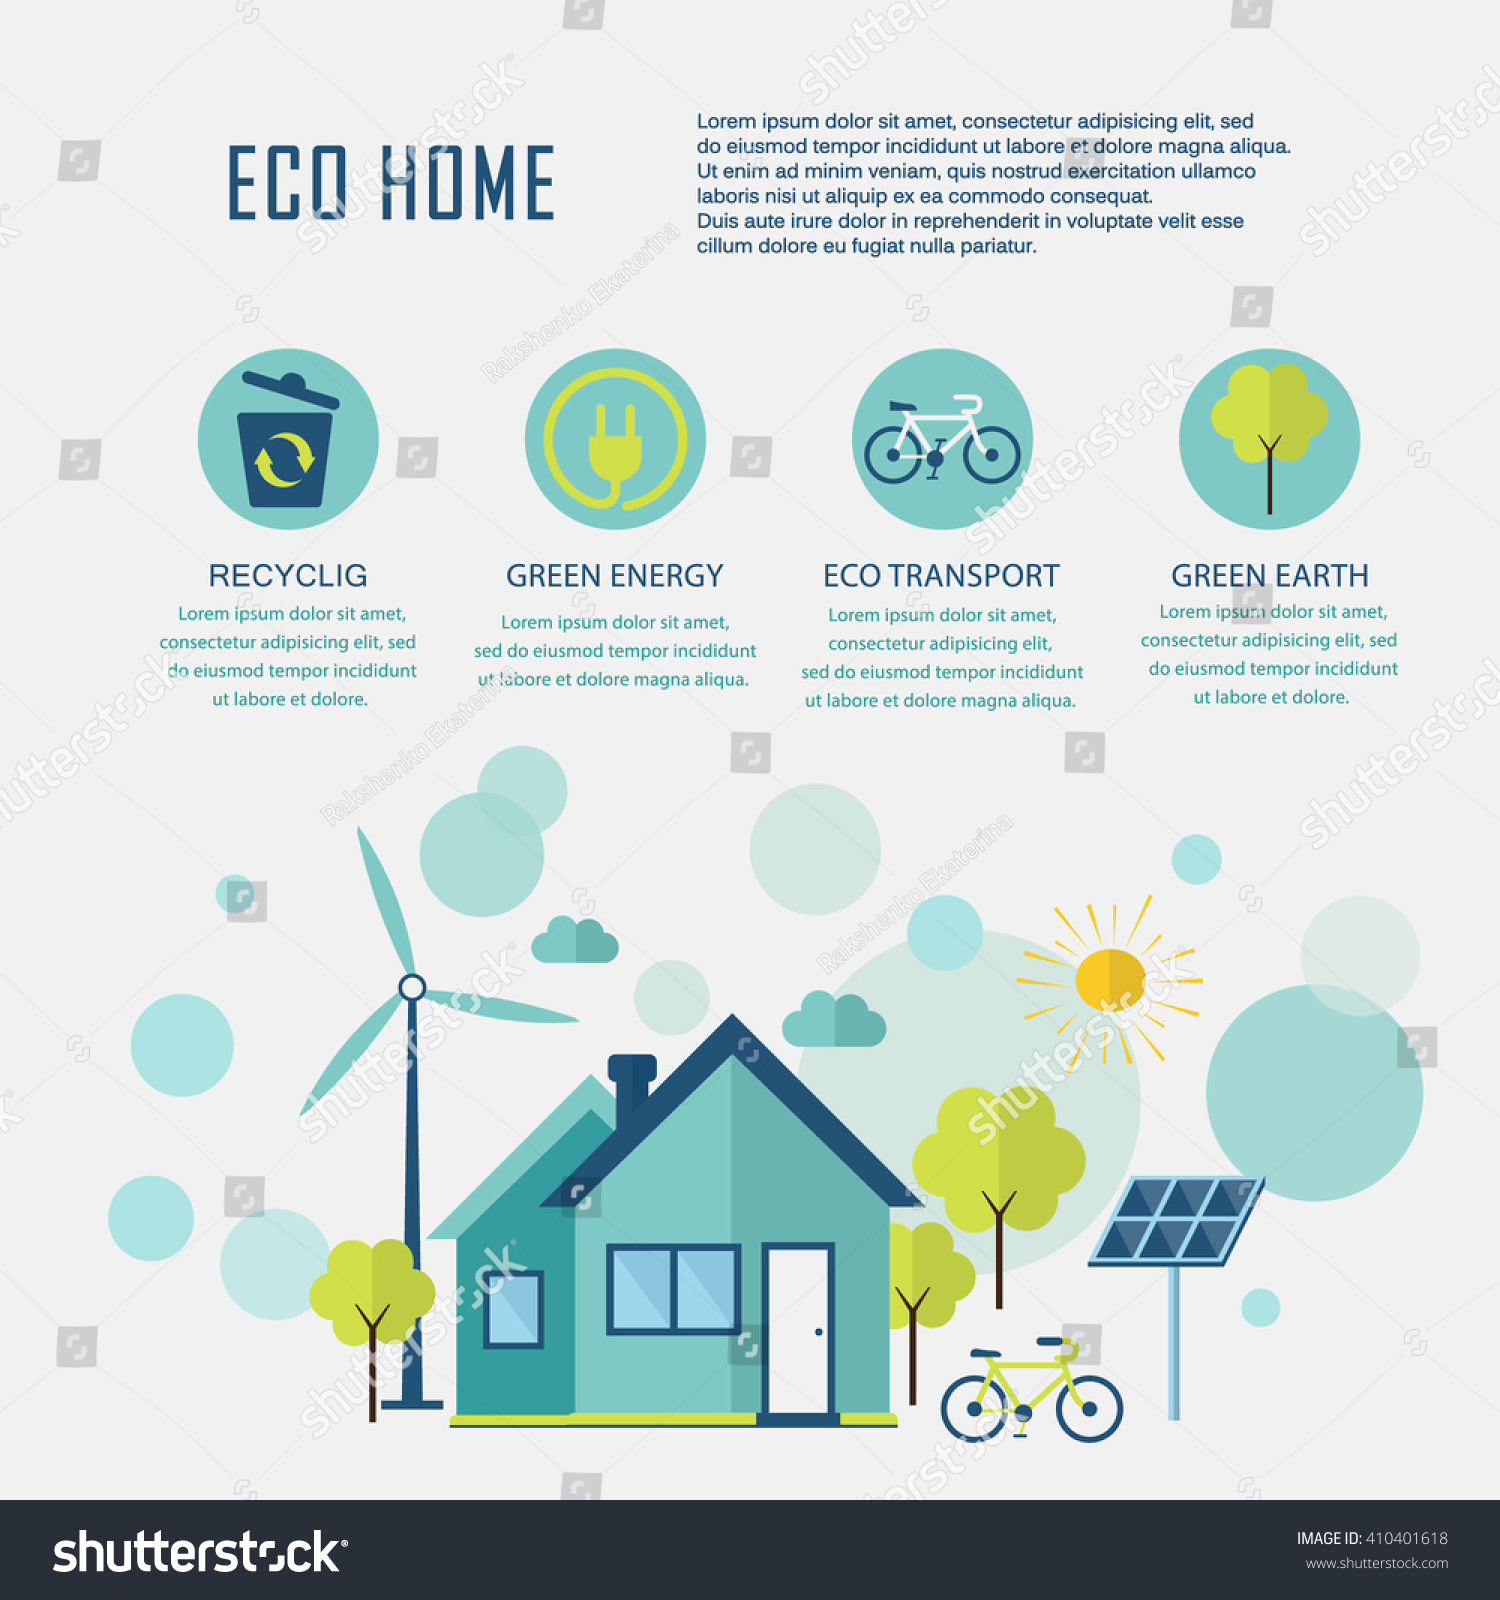 Eco Home Flat Design Ecology Concept Stock Vector 410401618 ...